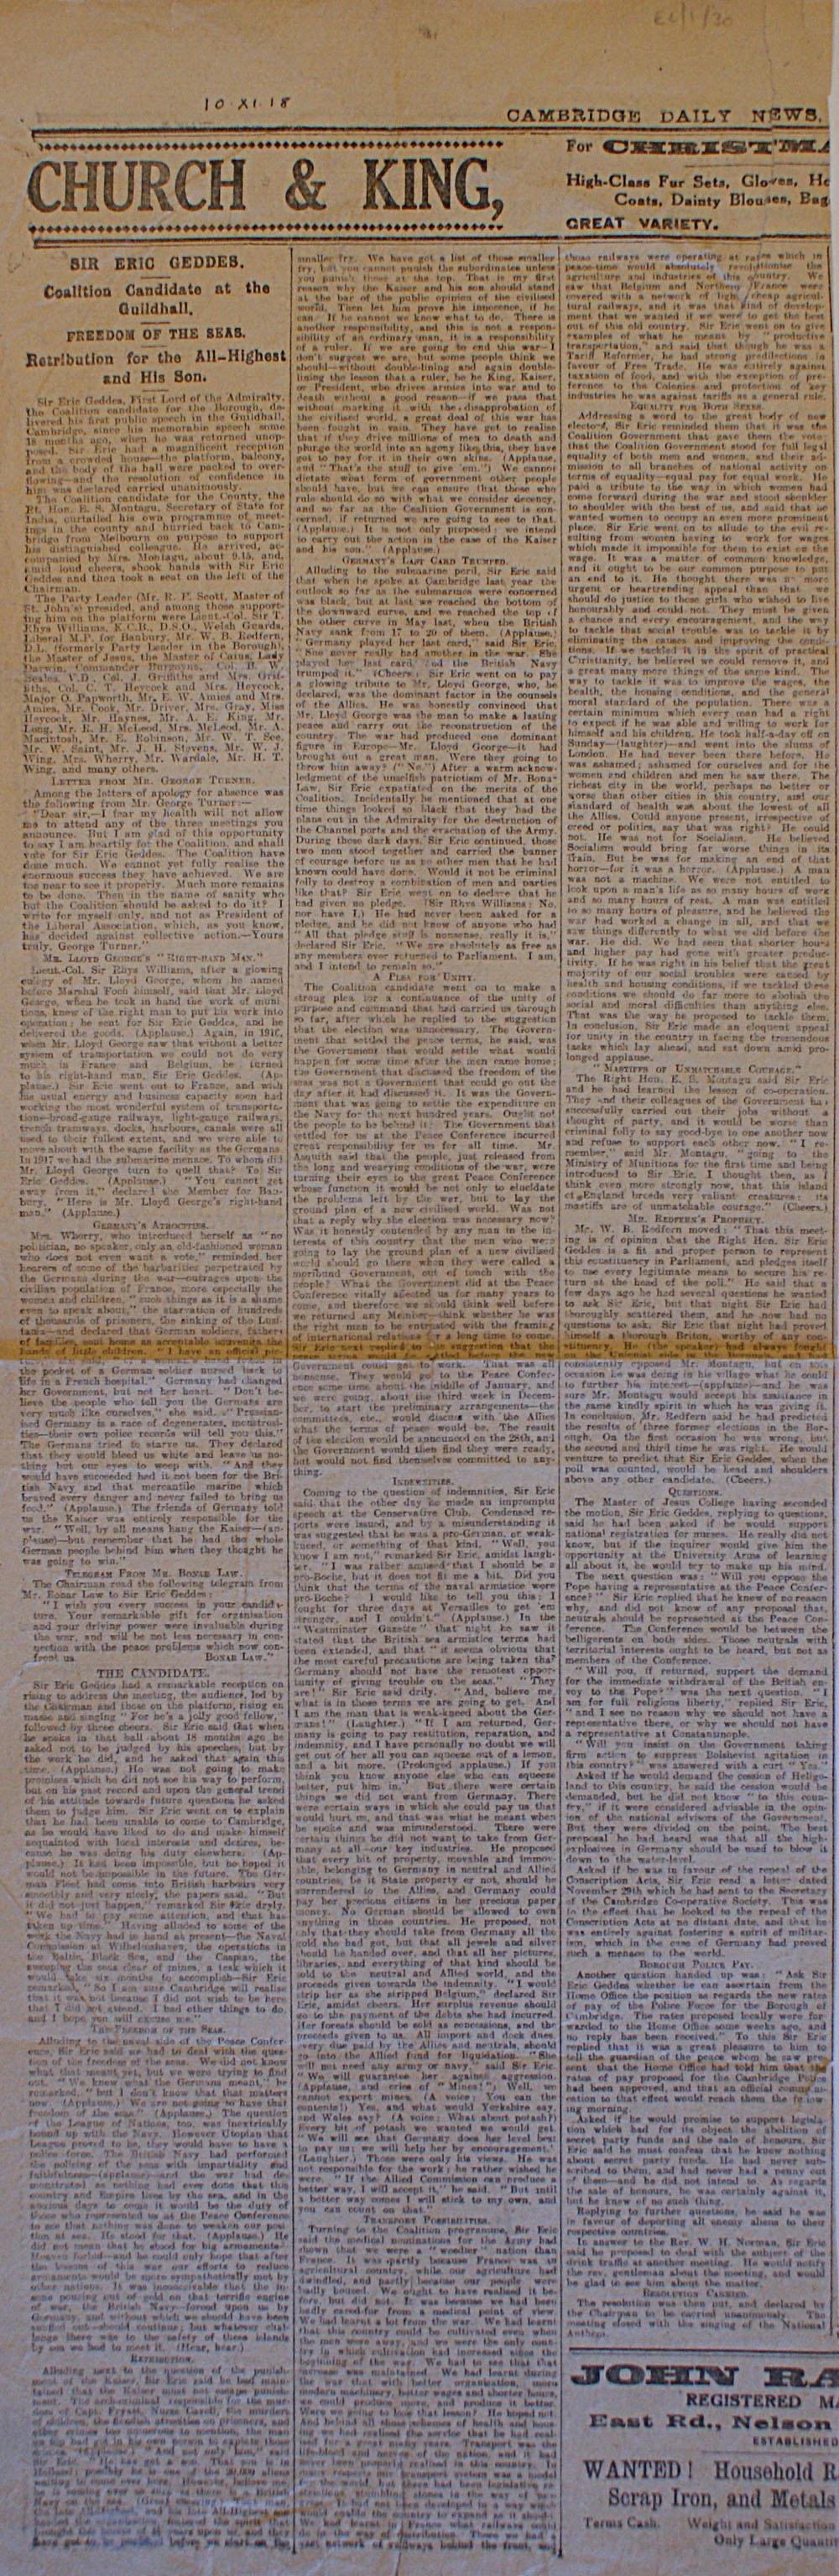 Article concerning Sir Eric Geddes' speech, printed in Cambridge Daily News, 12 November 1919 (JMK/EC/1/30).